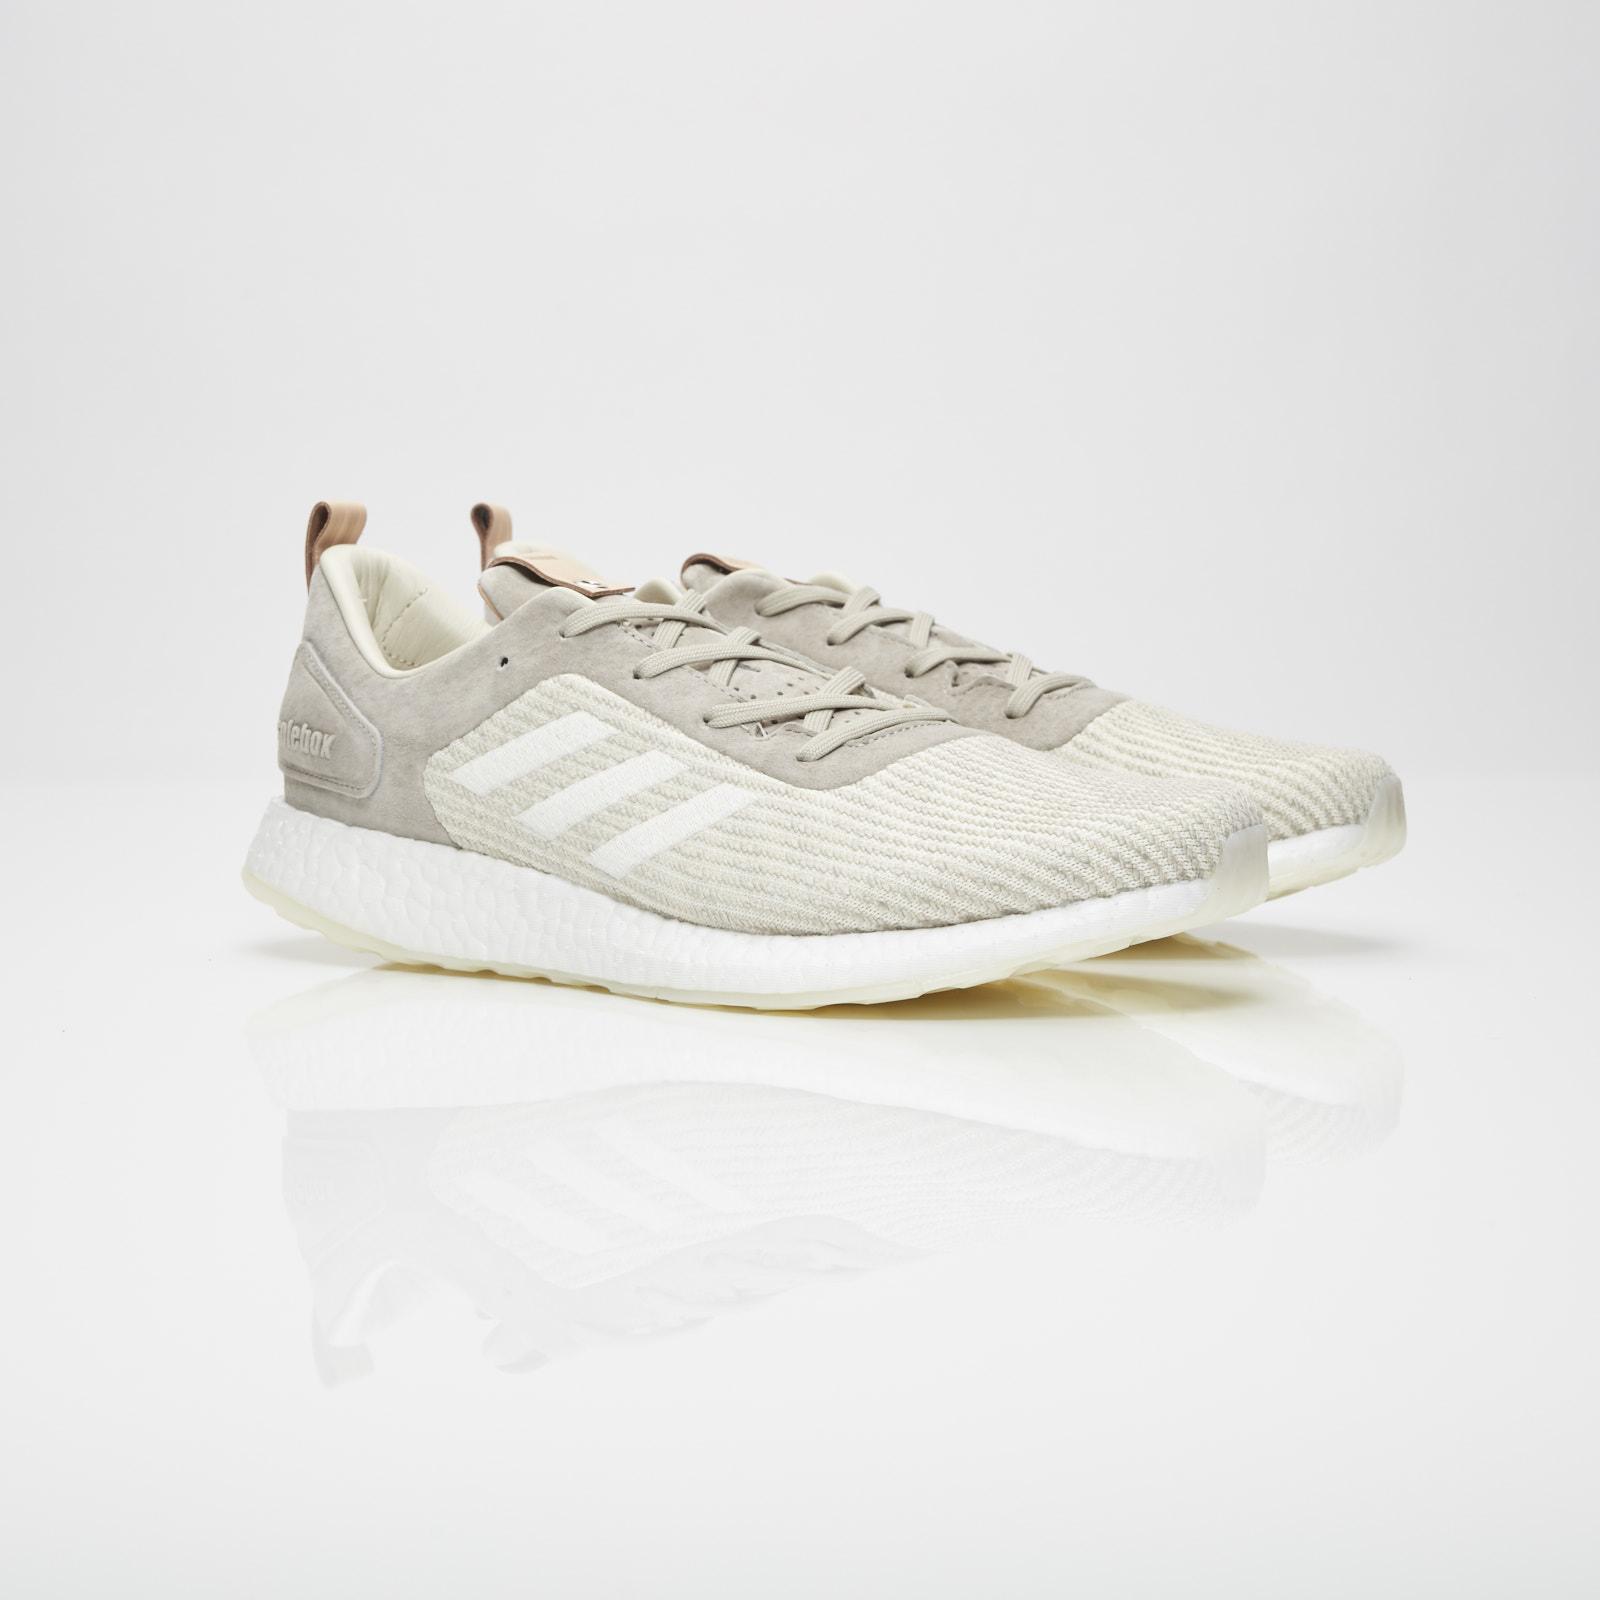 4ae10d6c8 adidas Pureboost DPR x Solebox - B27992 - Sneakersnstuff